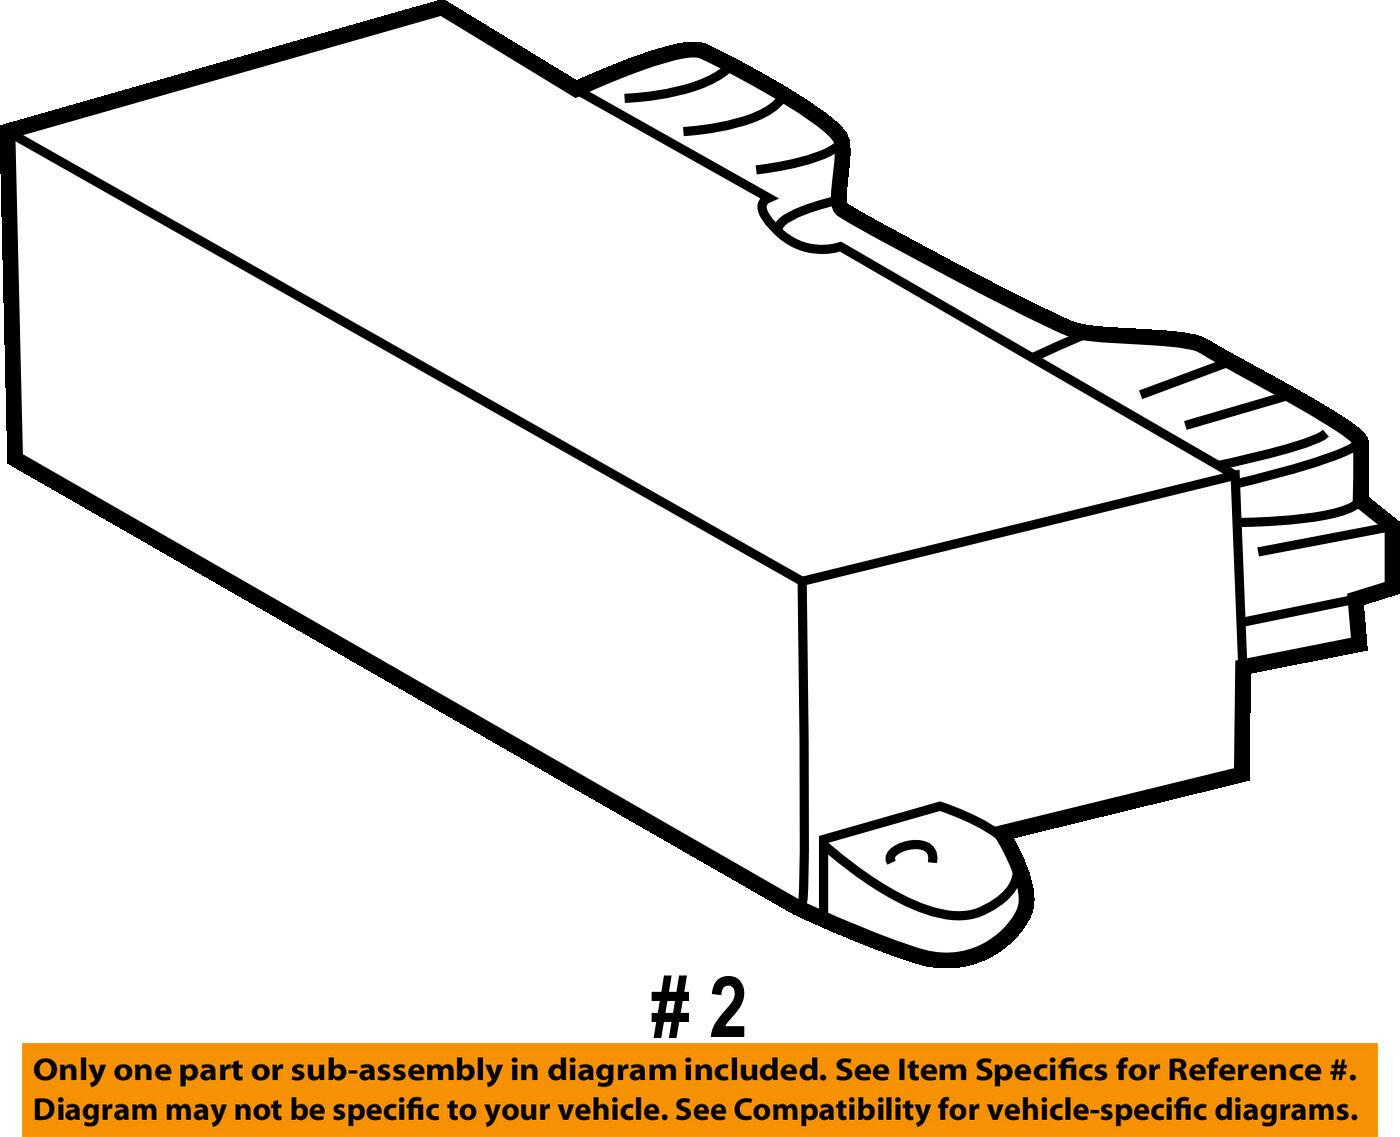 02 Mercedes Benz Cl500 Rear Window Control Unit Module 2158202326 Ebay 2001 Cl600 Fuse Diagram Norton Secured Powered By Verisign